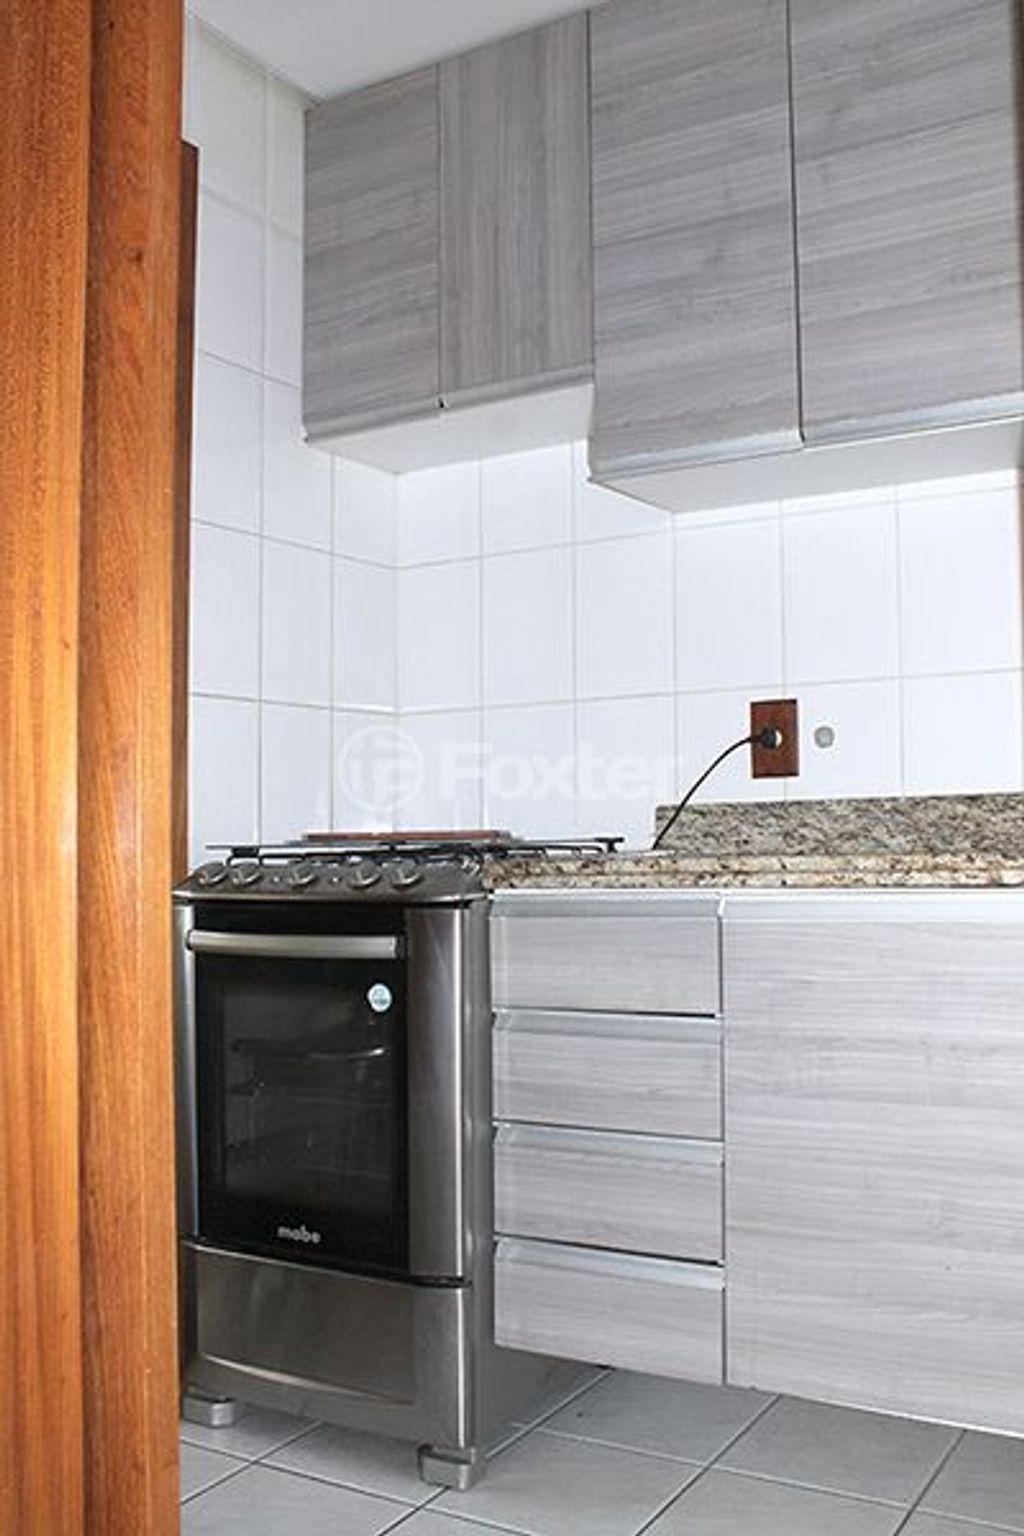 Apto 2 Dorm, Petrópolis, Porto Alegre (145742) - Foto 10